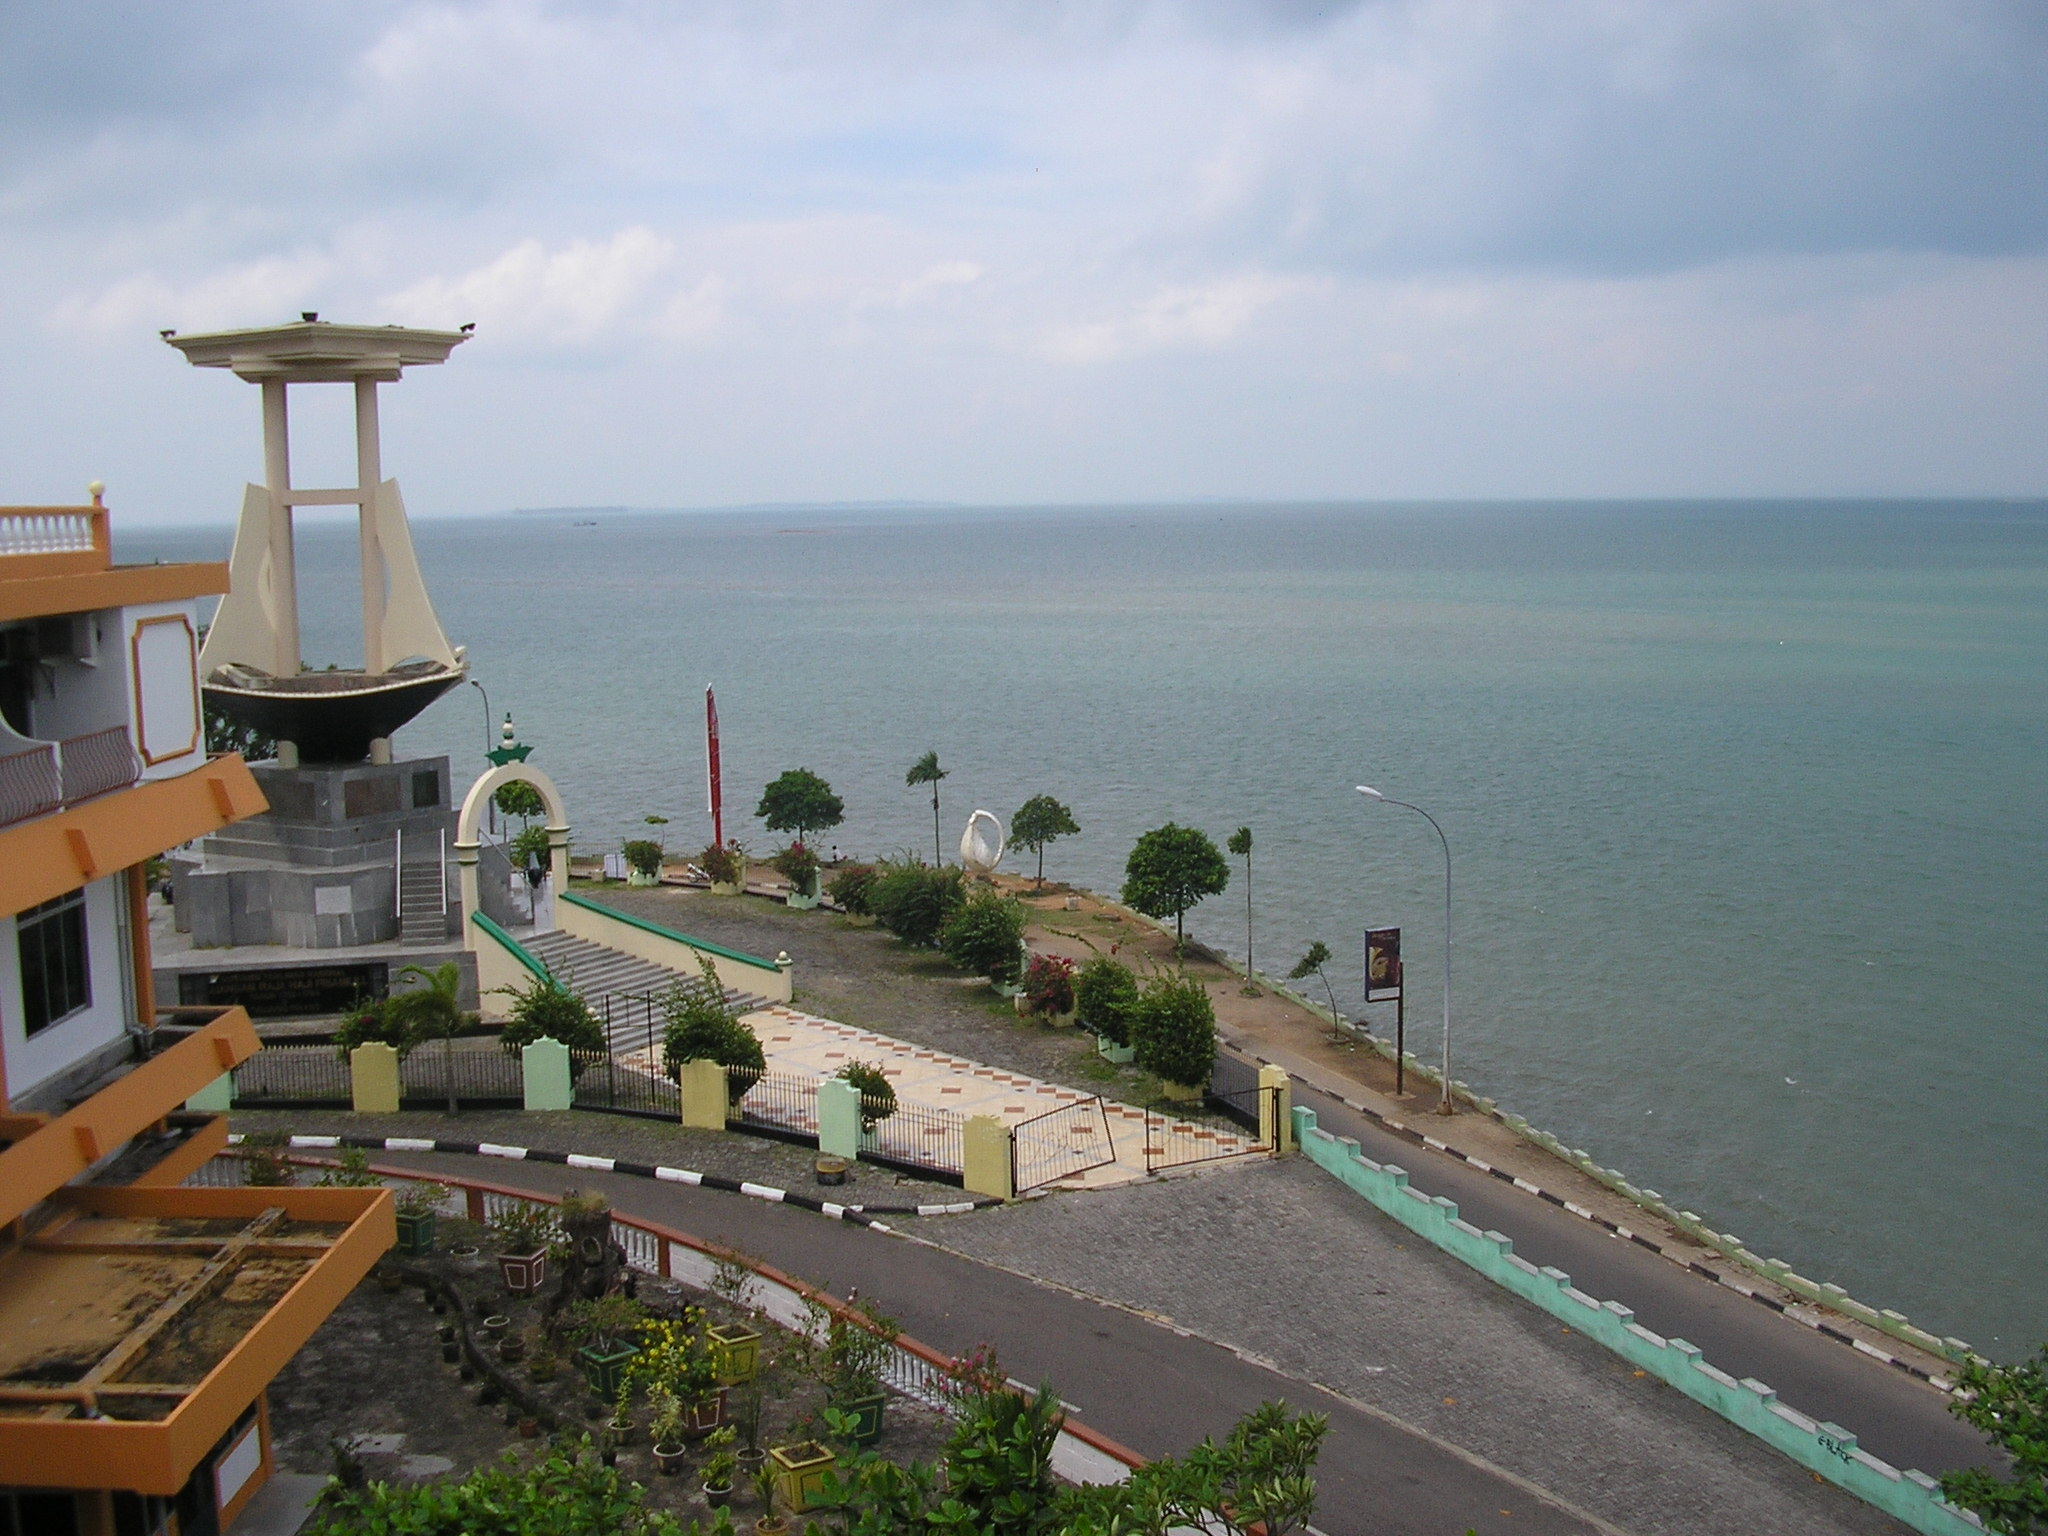 Tanjung Pinang